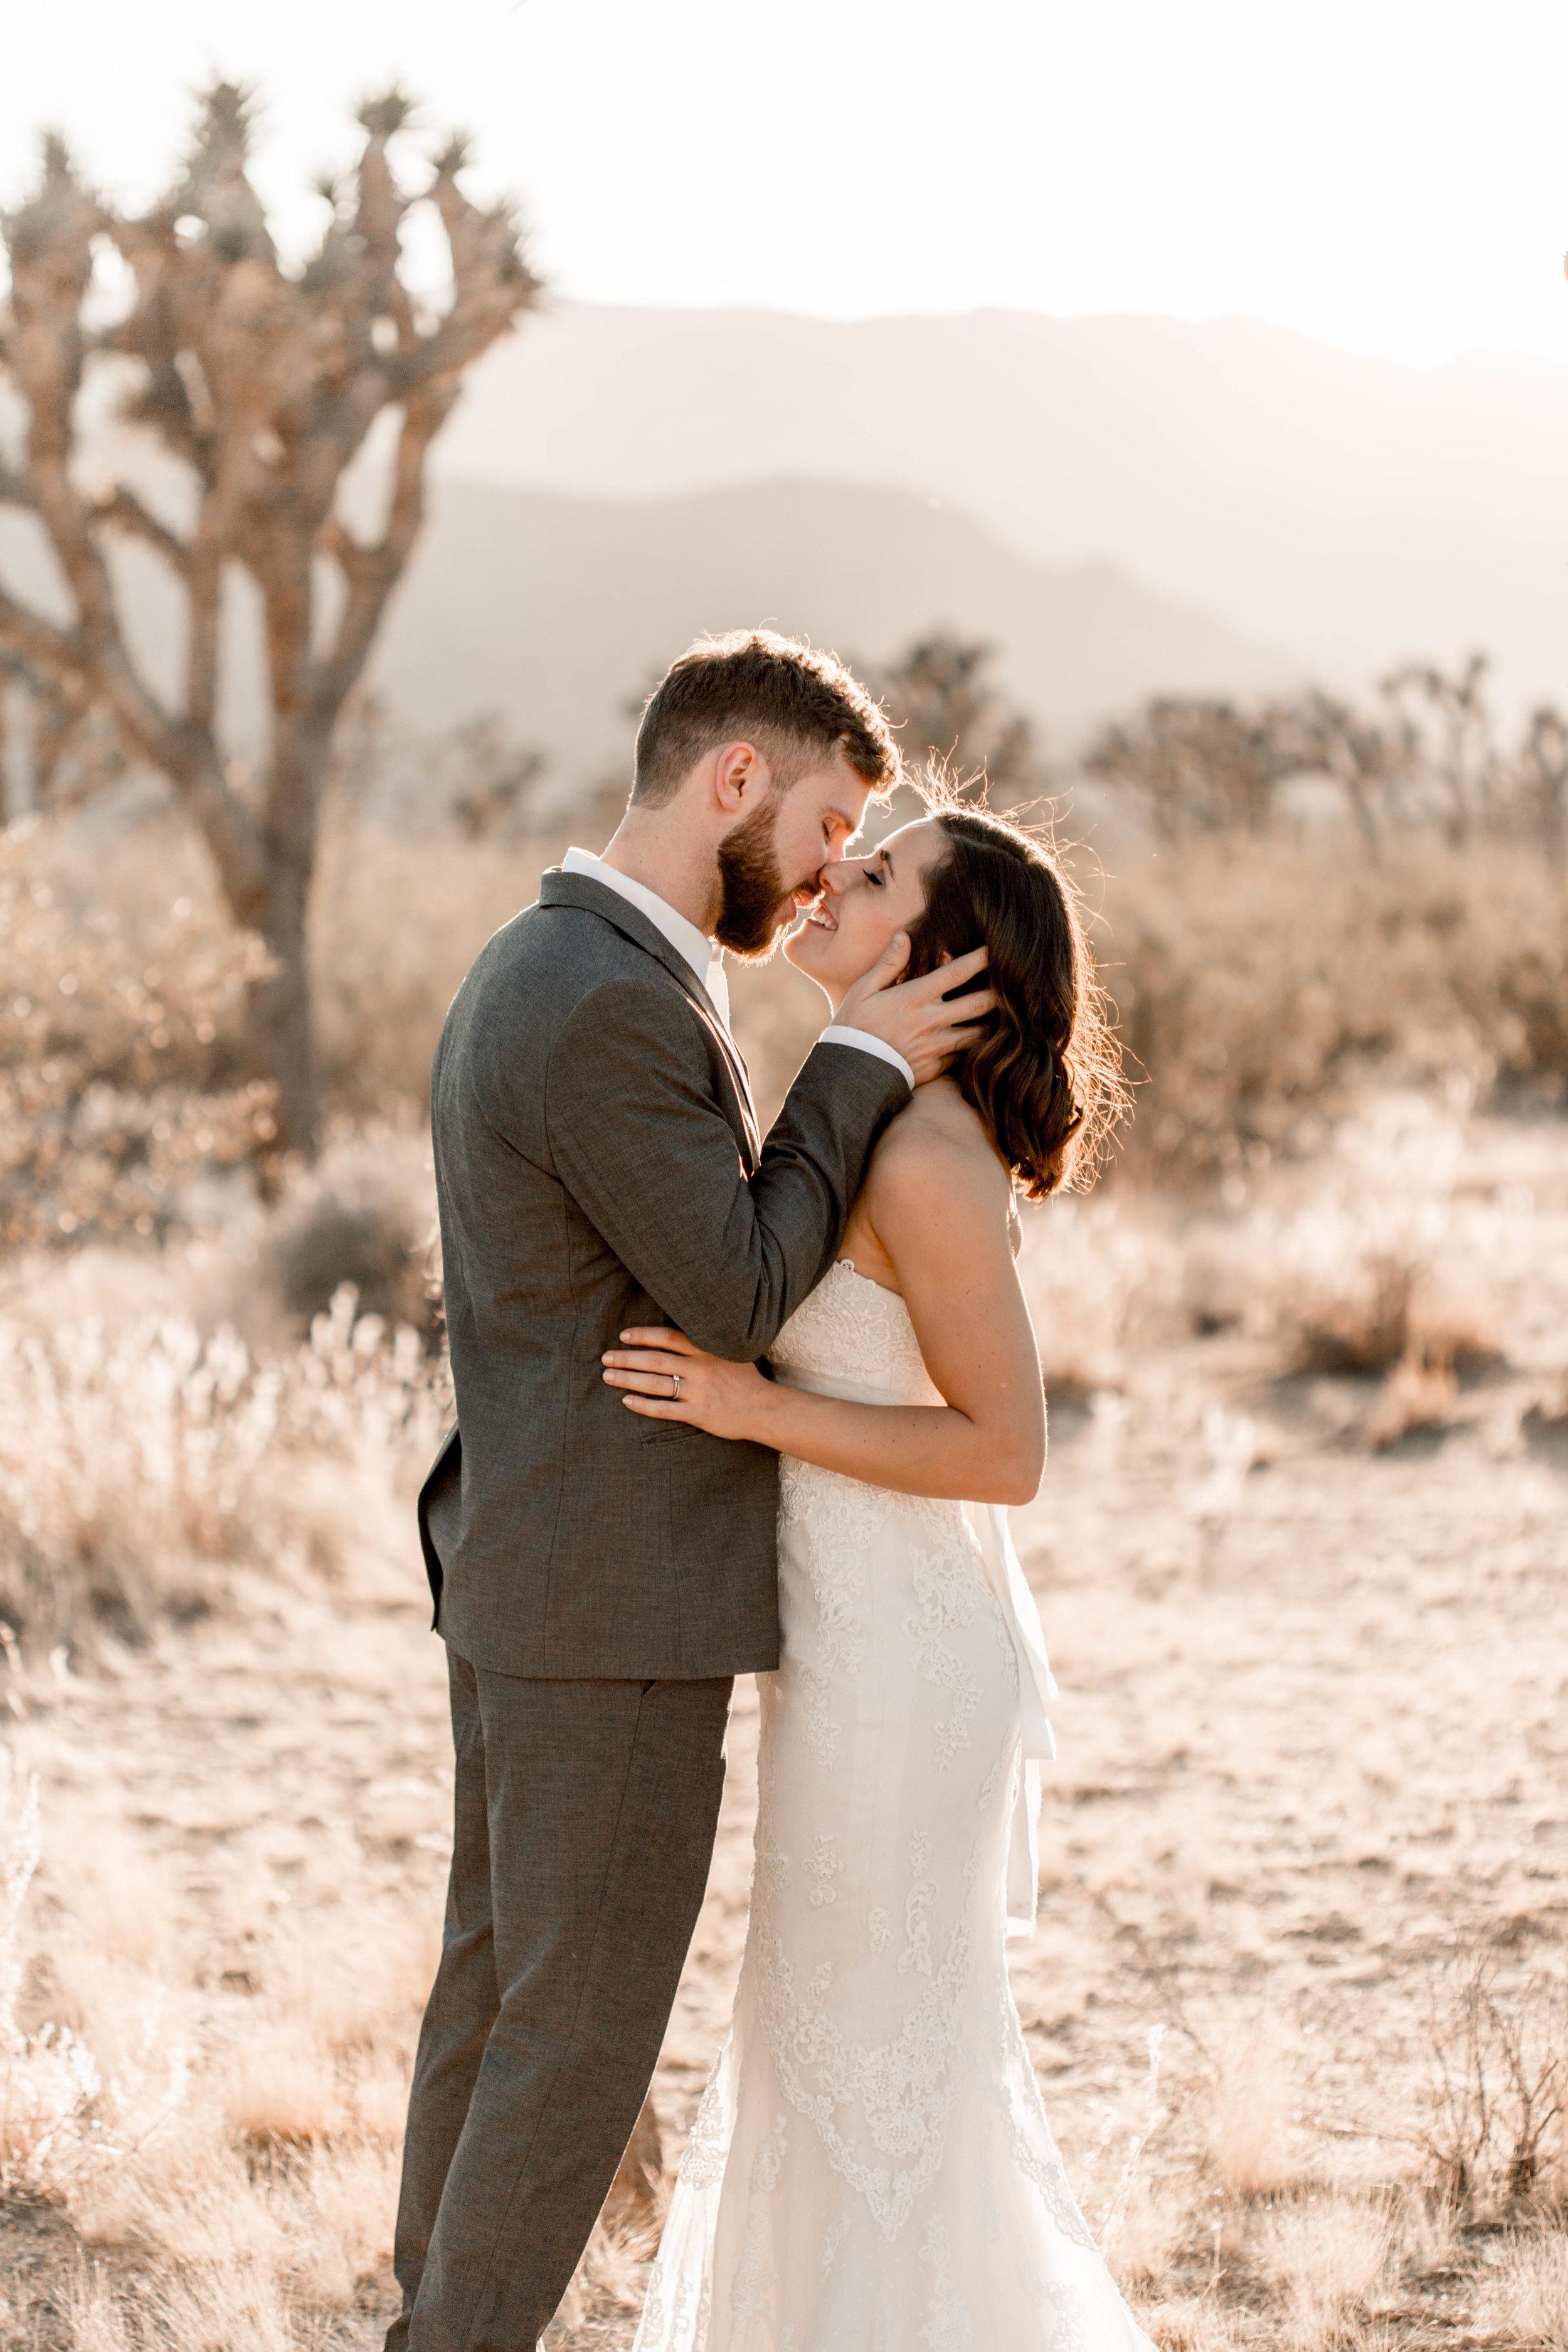 nicole-daacke-photography-joshua-tree-adventurous-elopement-wedding-national-park-wedding-photographer-adventure-wedding-adventurous-elopement-jtree-joshua-tree-national-park-wedding-photographer-intimate-weddings-golden-desert-love-13.jpg